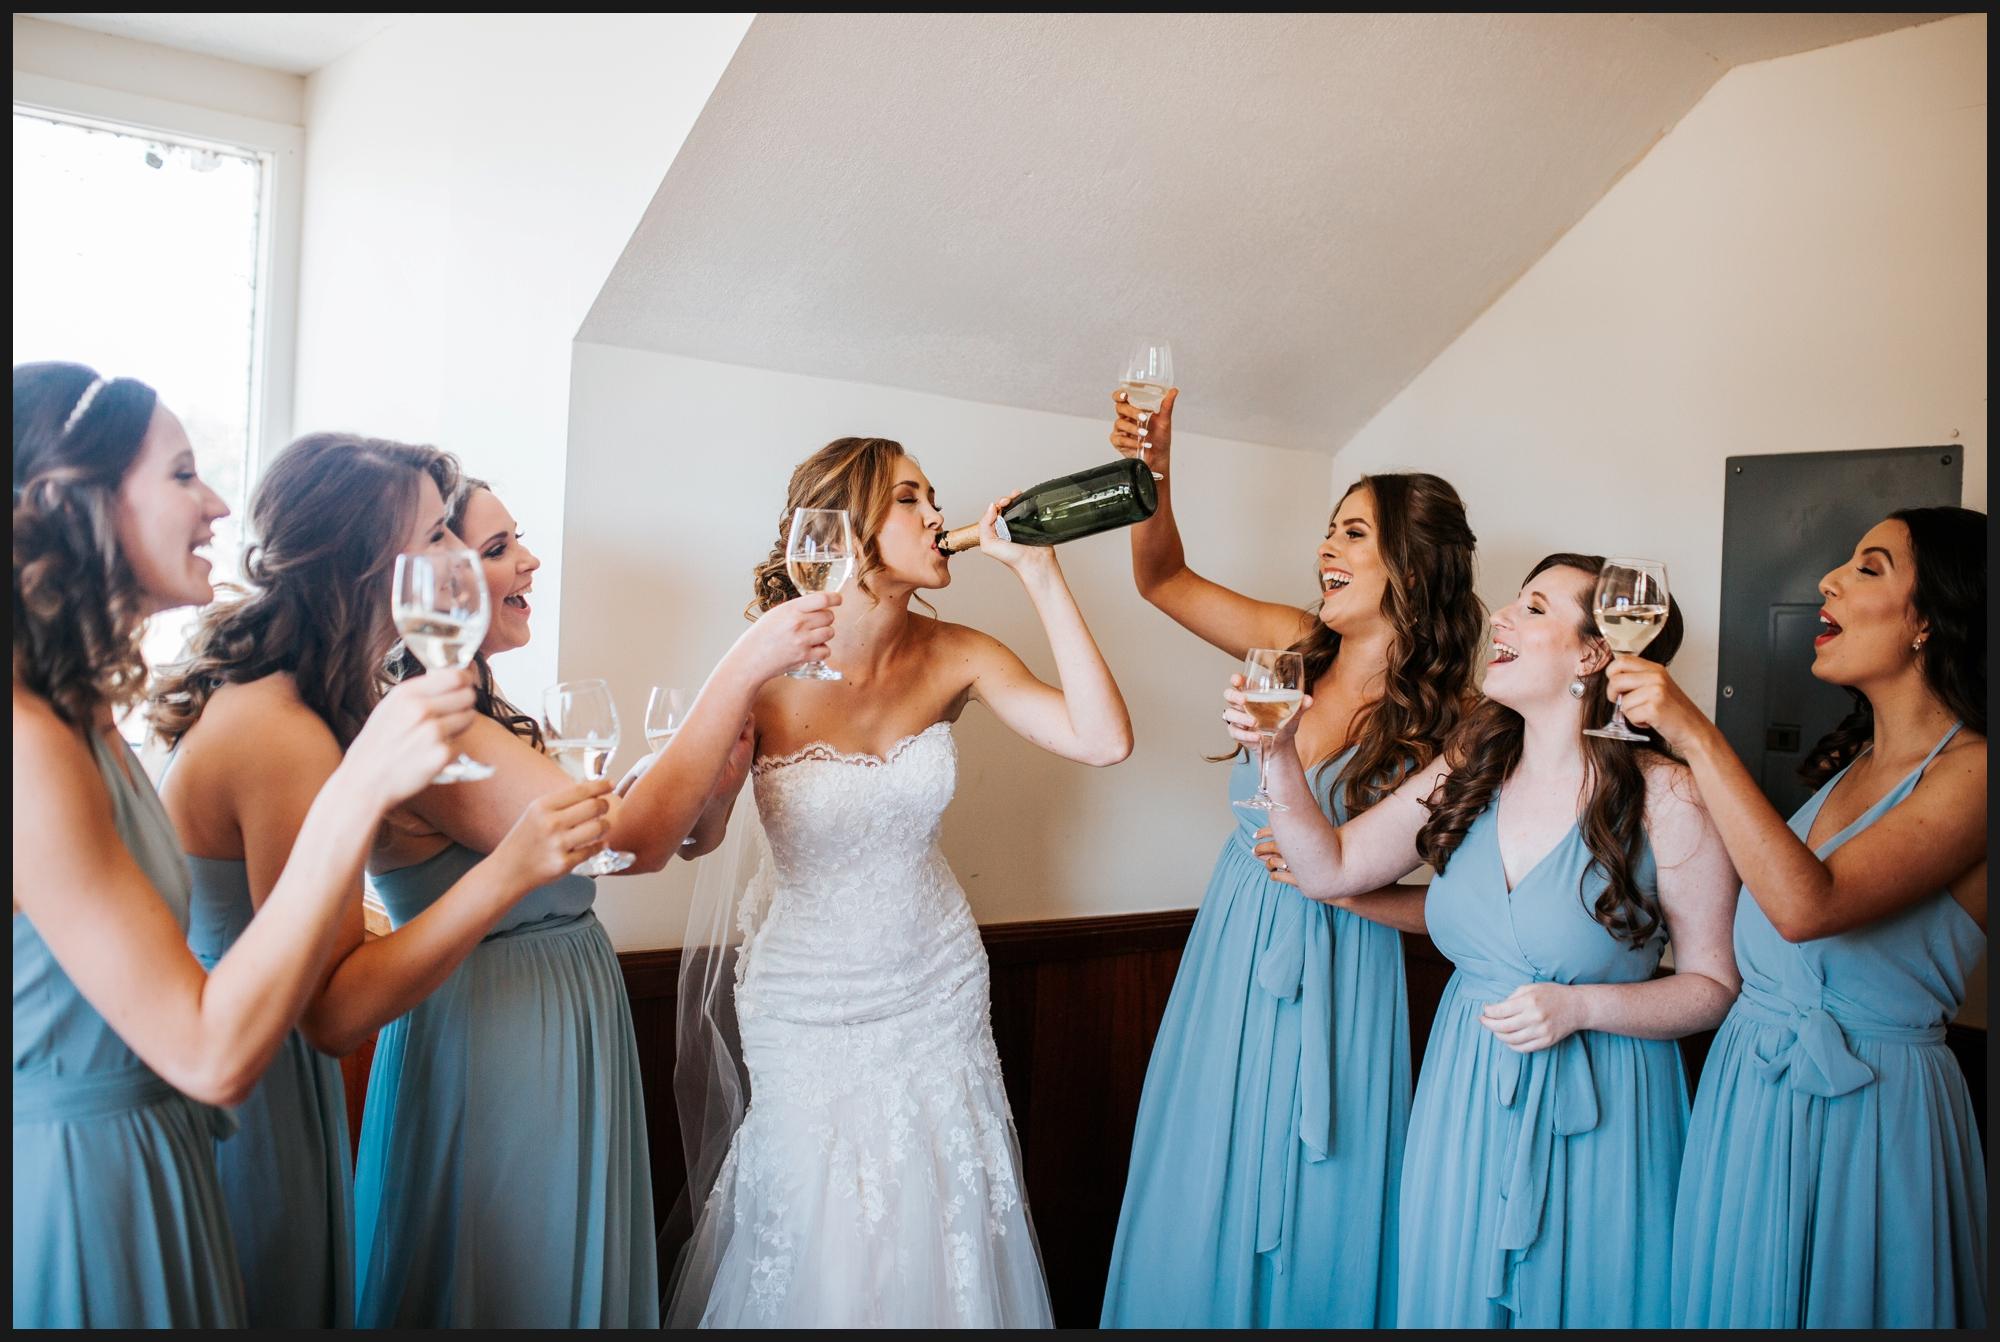 Orlando-Wedding-Photographer-destination-wedding-photographer-florida-wedding-photographer-bohemian-wedding-photographer_0060.jpg